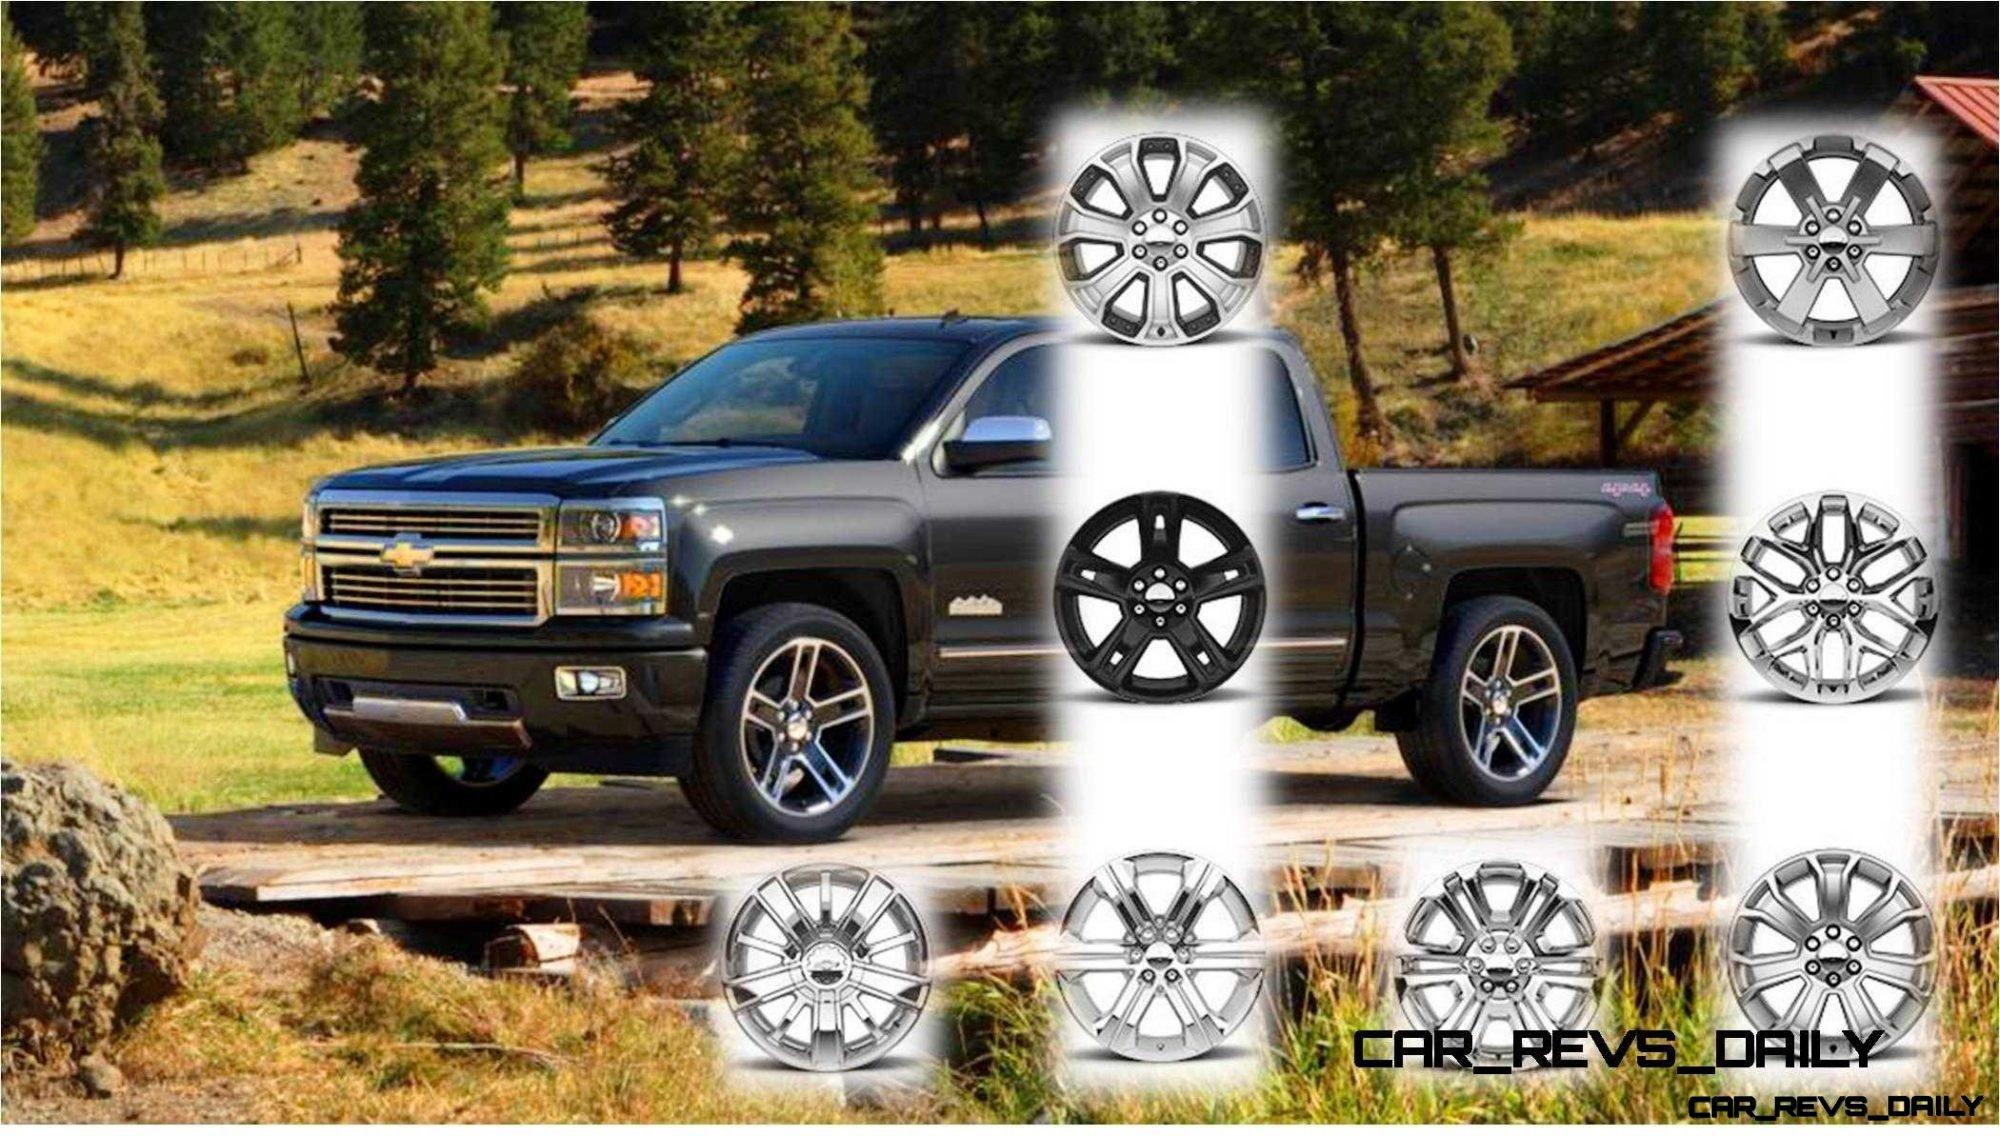 Silverado Wheels header image carrevsdaily